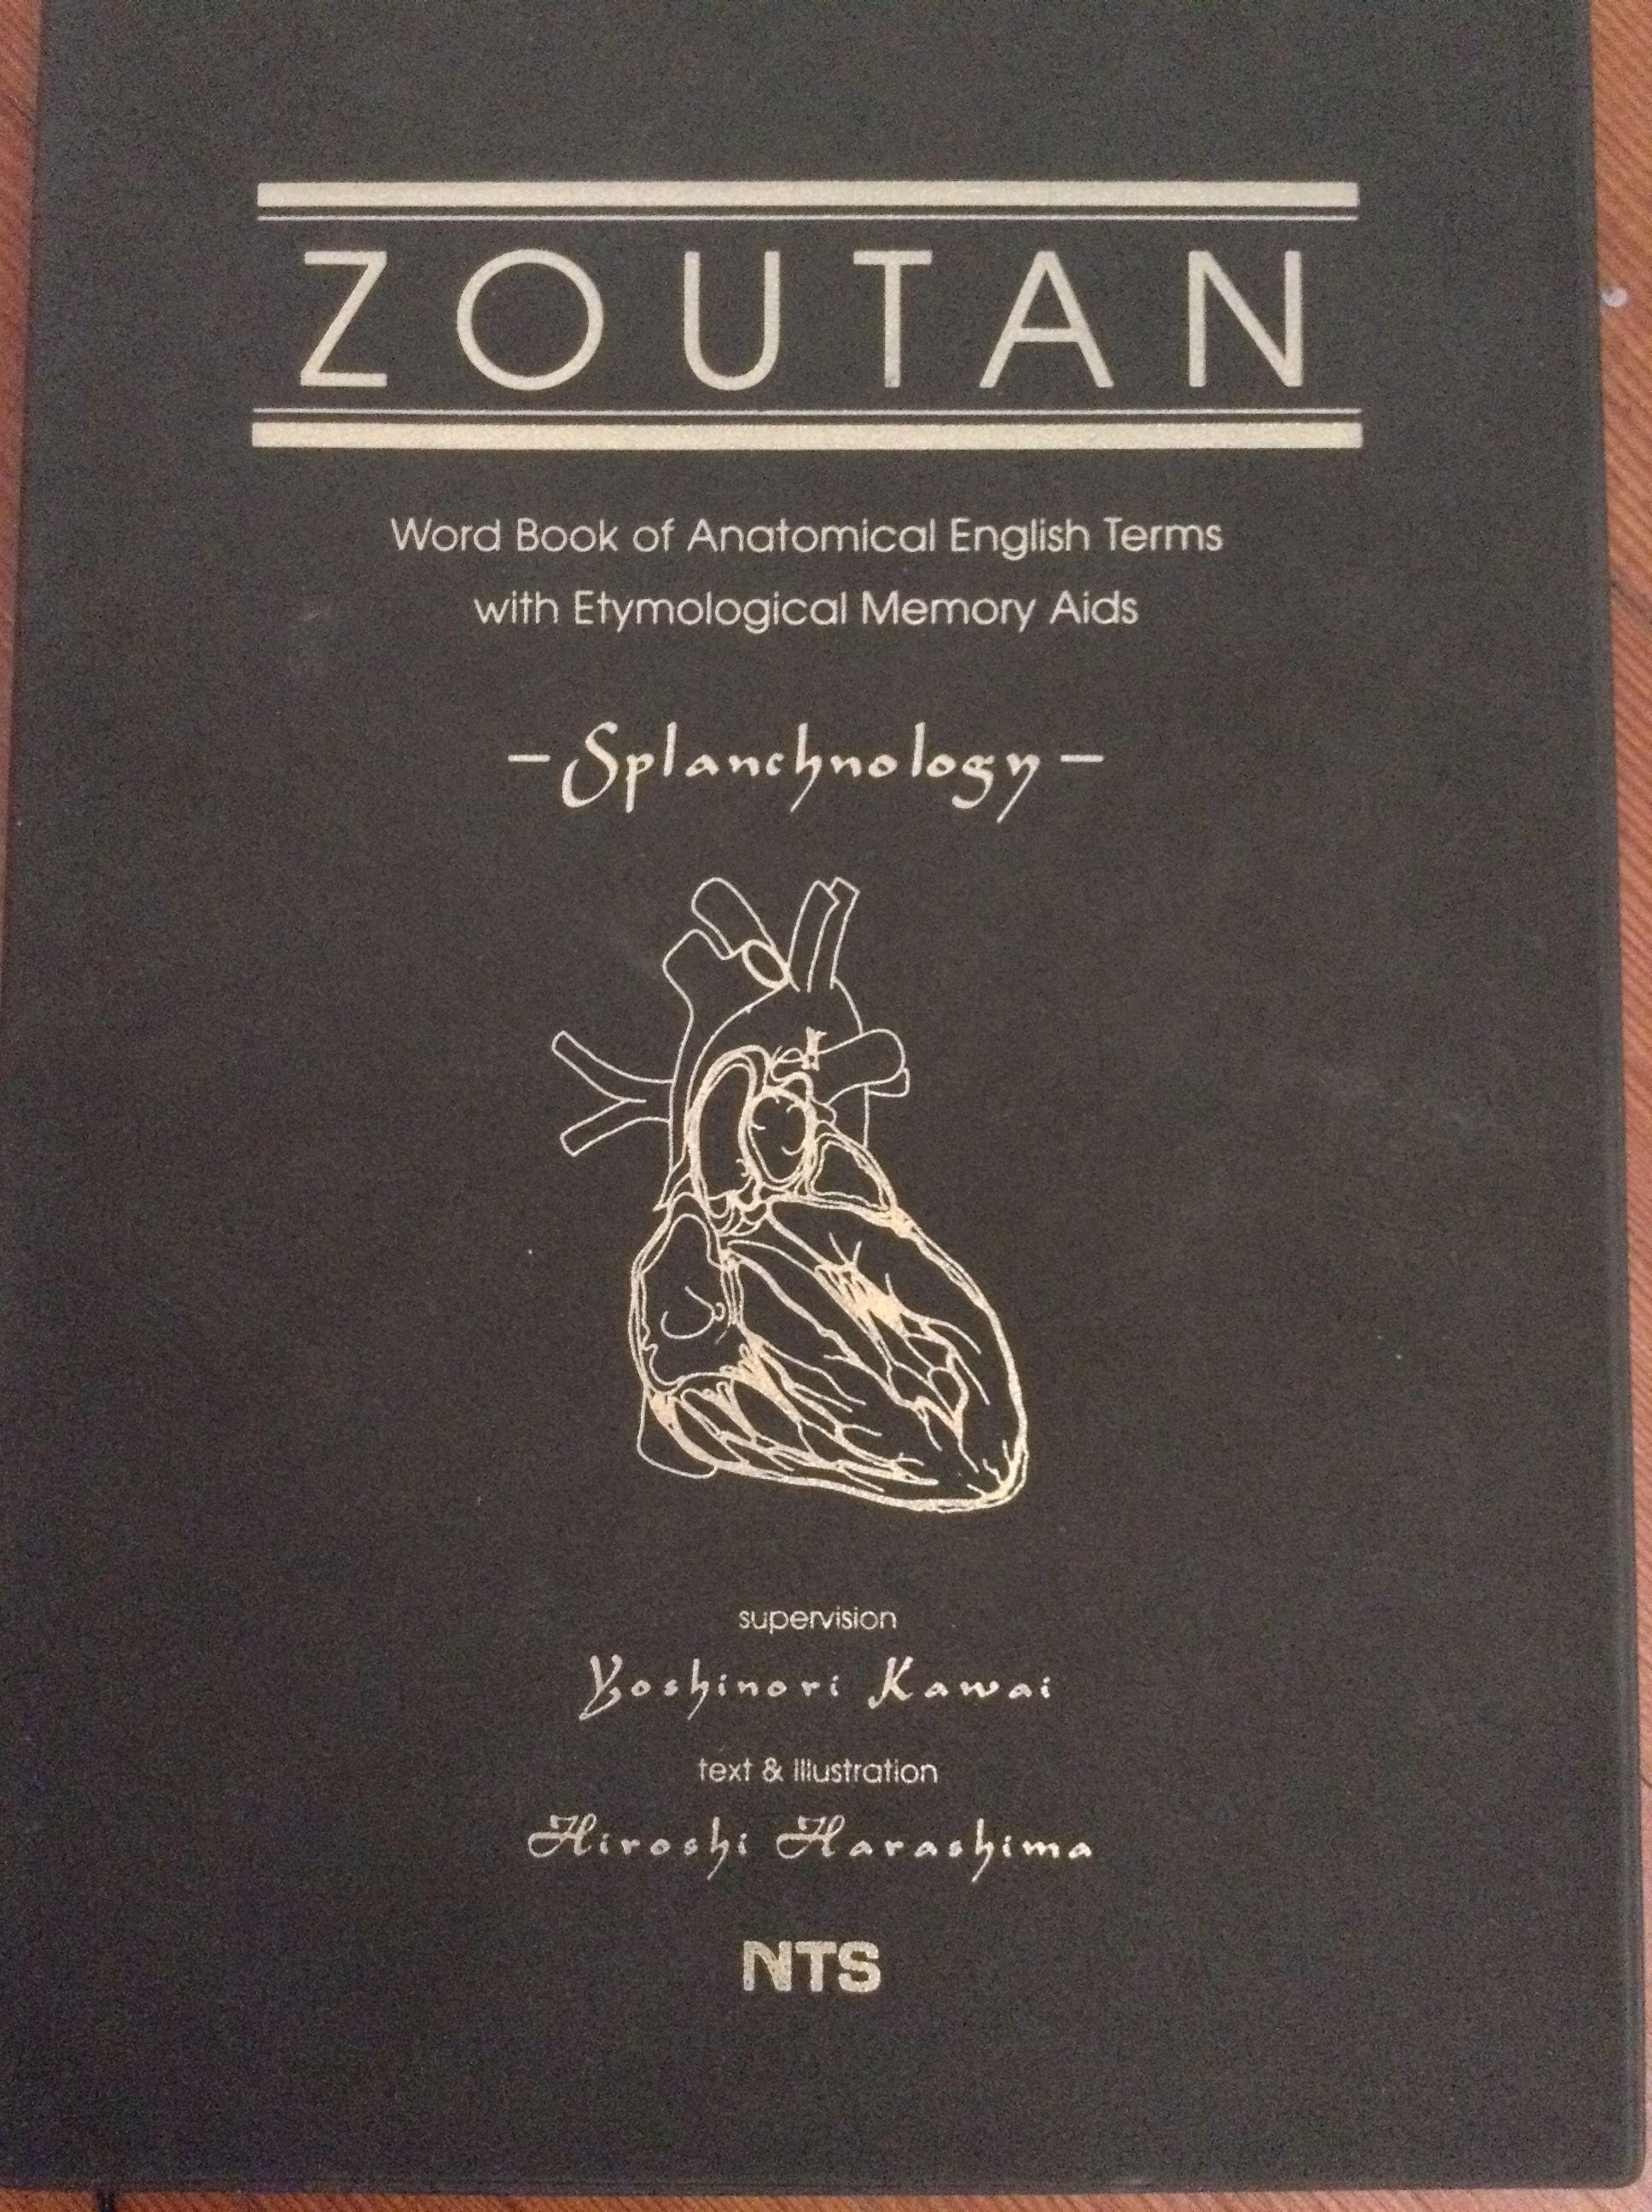 ZOUTAN - Japanese - English Anatomy Dictionary | YOGA BOOK SHELFIE ...